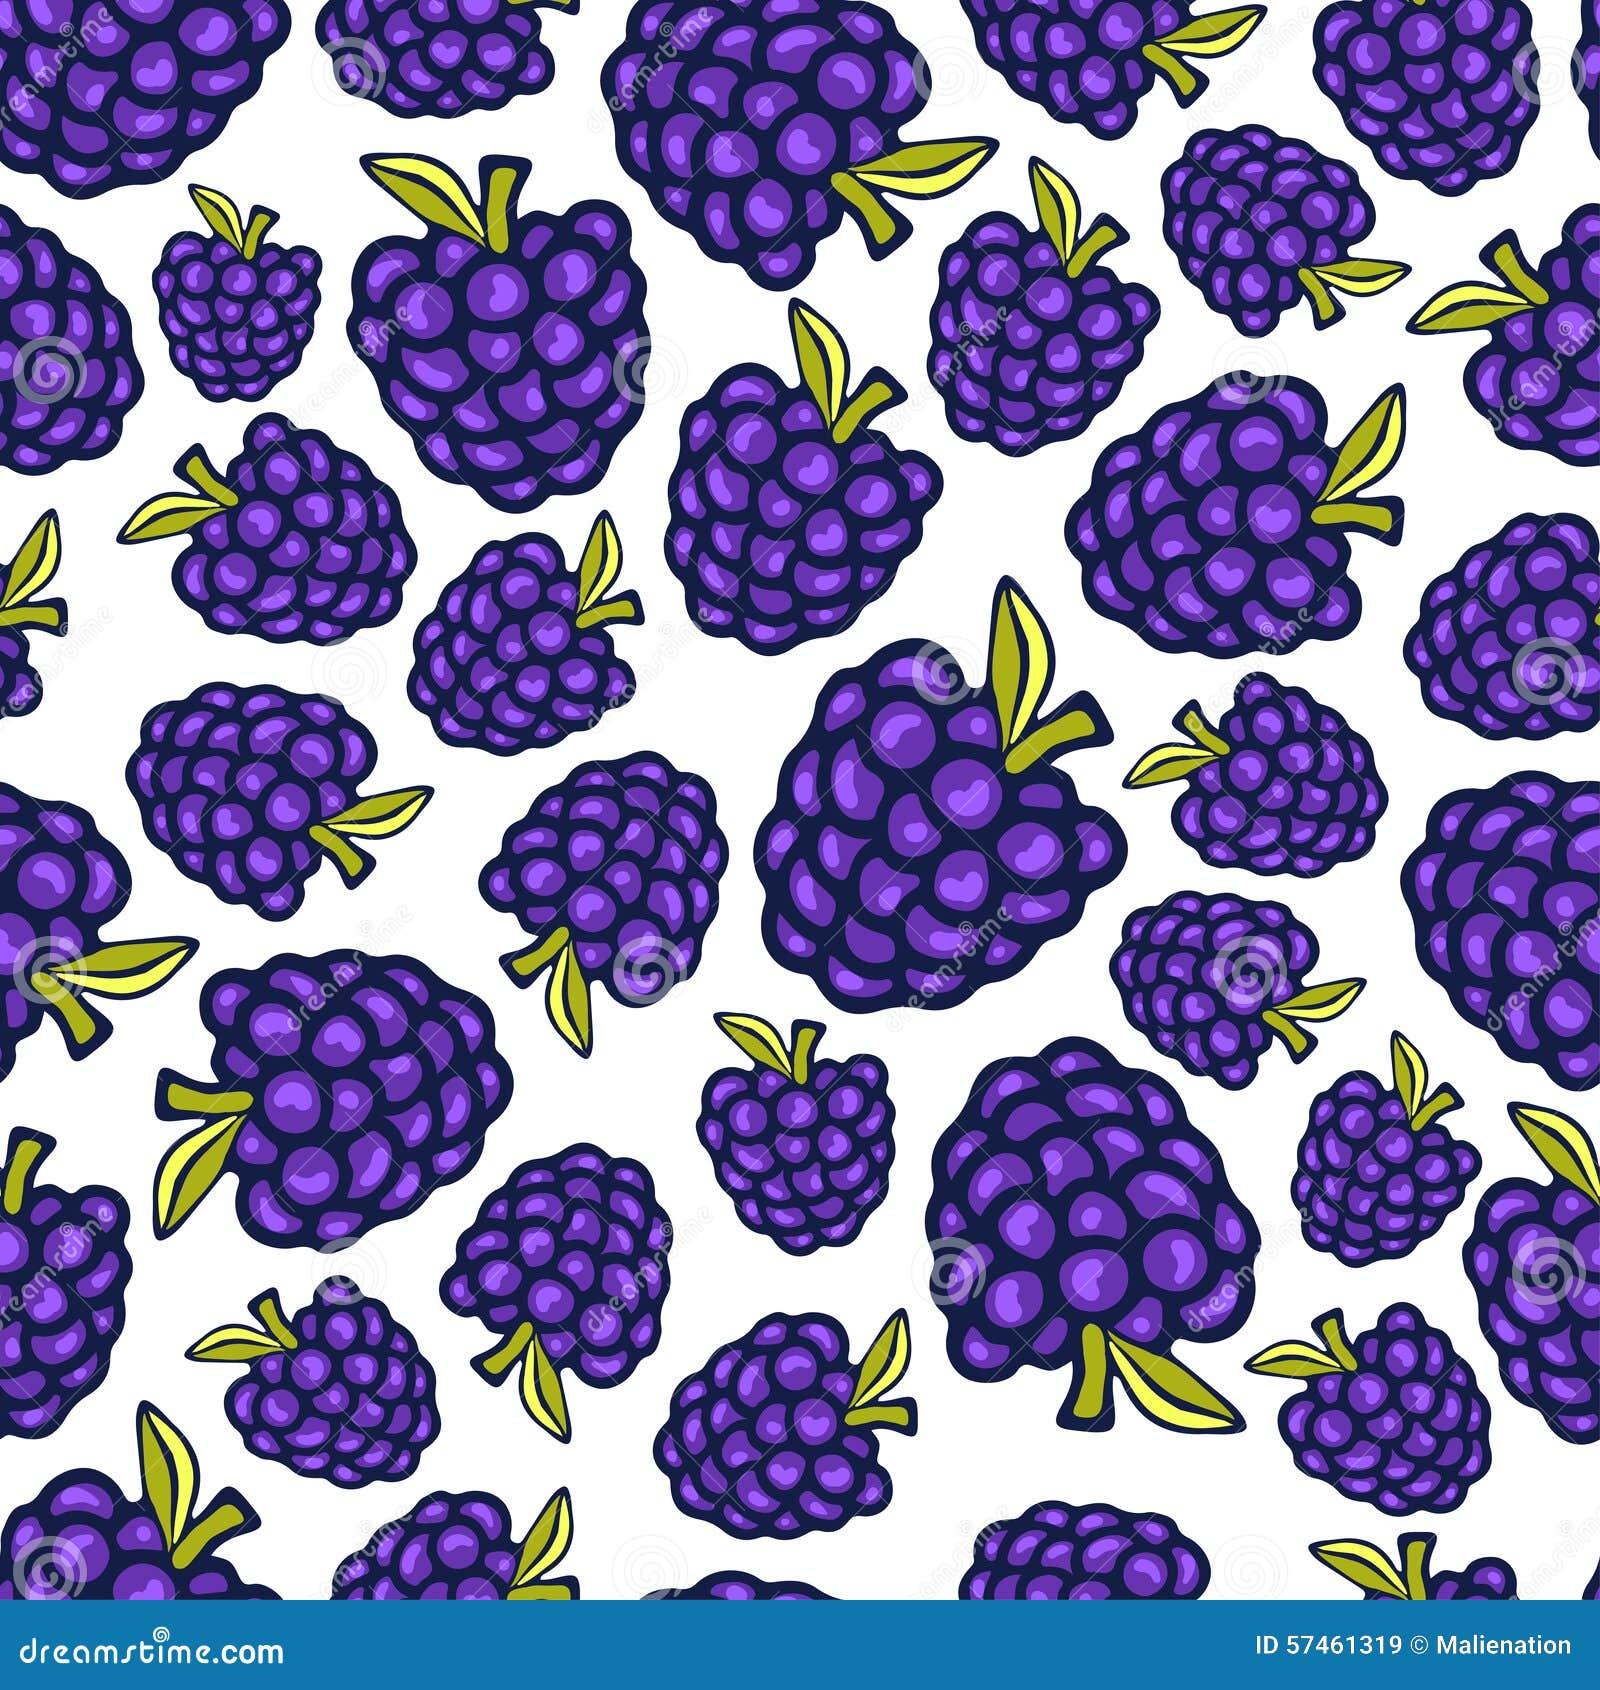 wallpaper blackberry pattern - photo #16